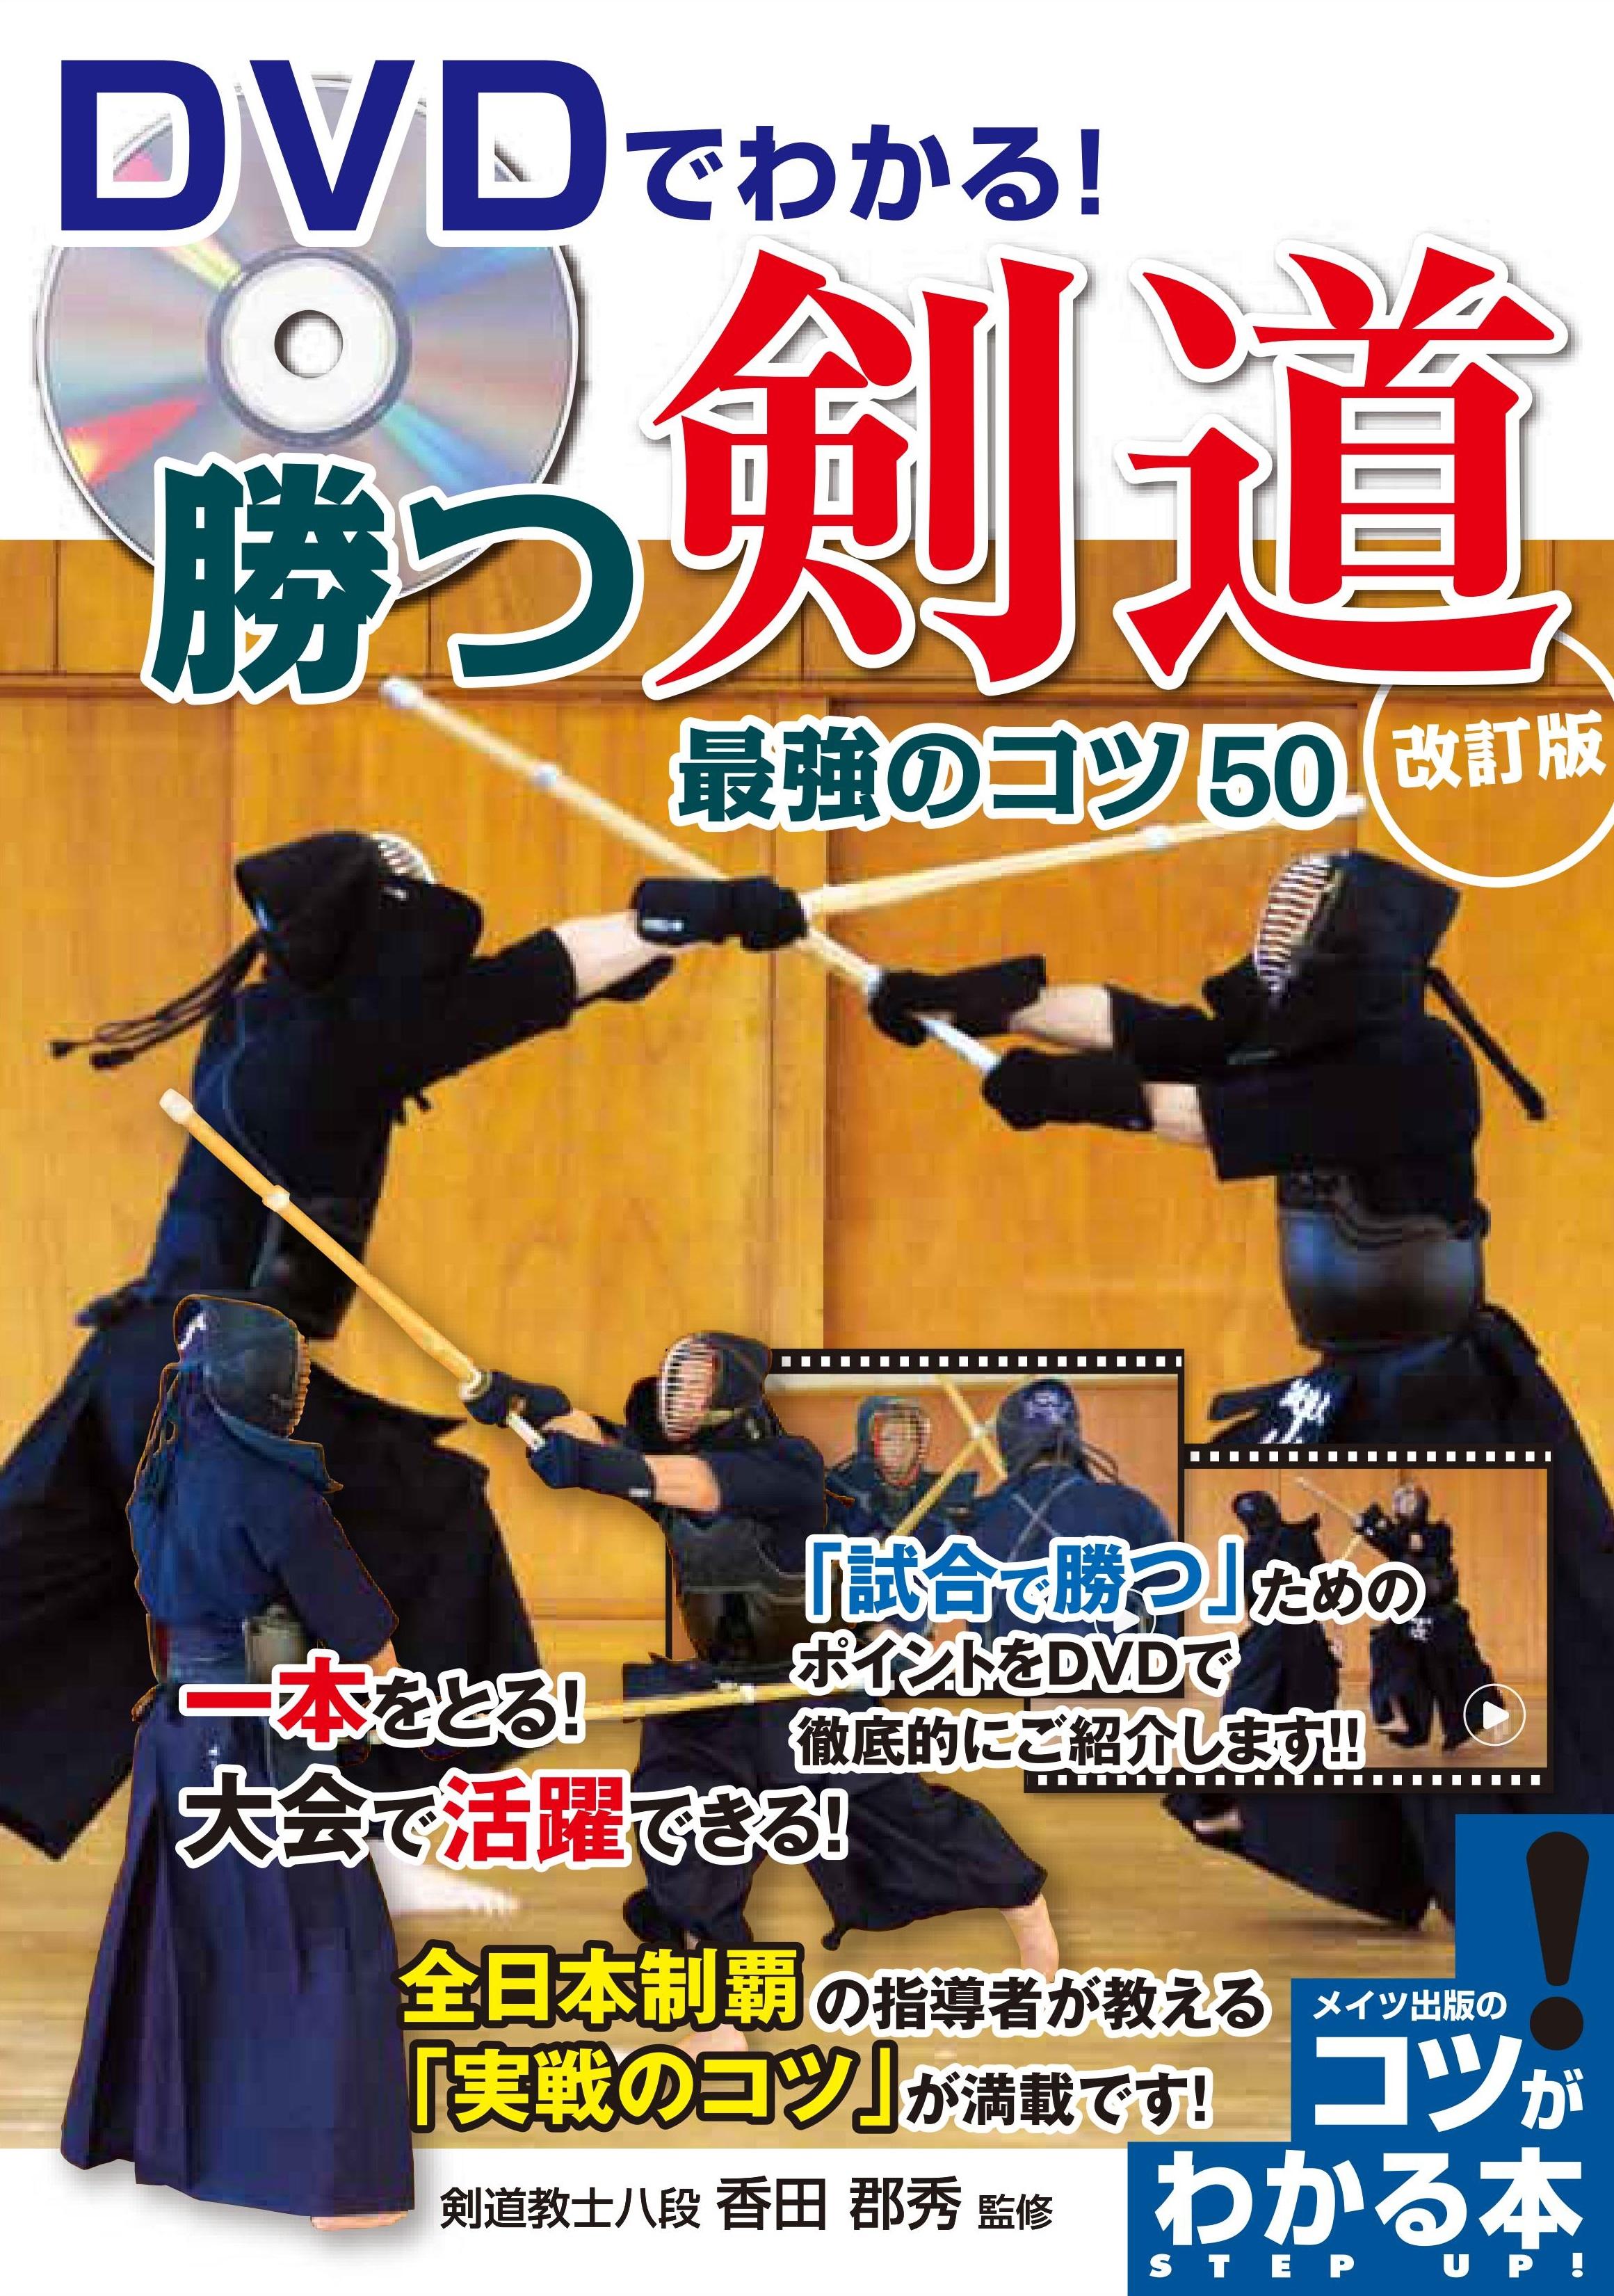 DVDでわかる!勝つ剣道 最強のコツ50 改訂版